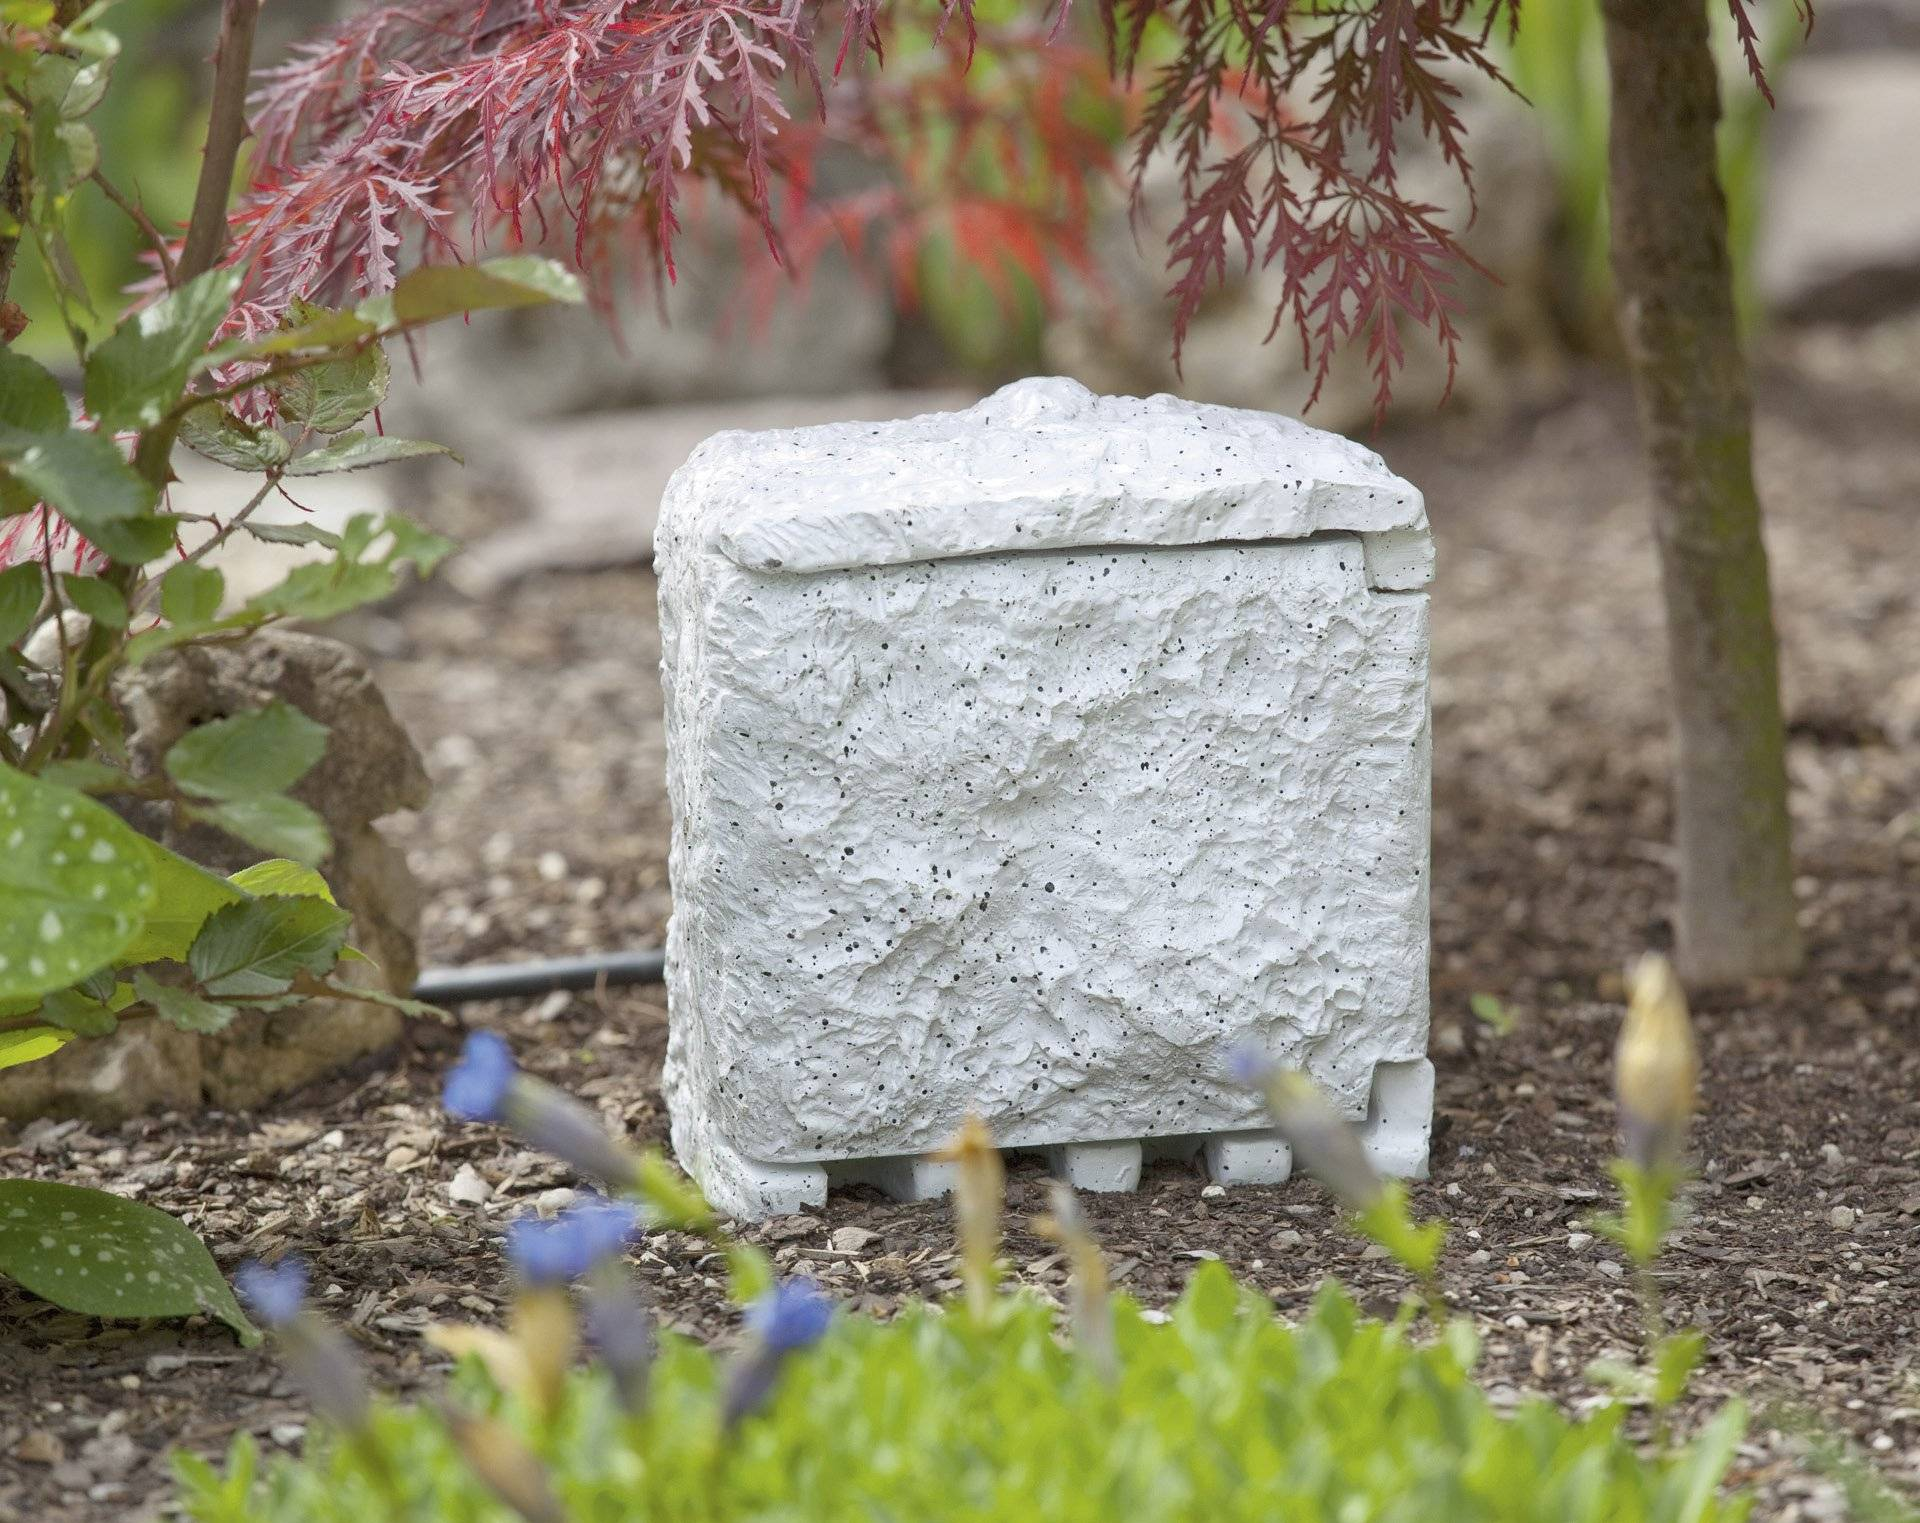 Zahradní zásuvka Renkforce 1168609, bílošedá, 4násobná